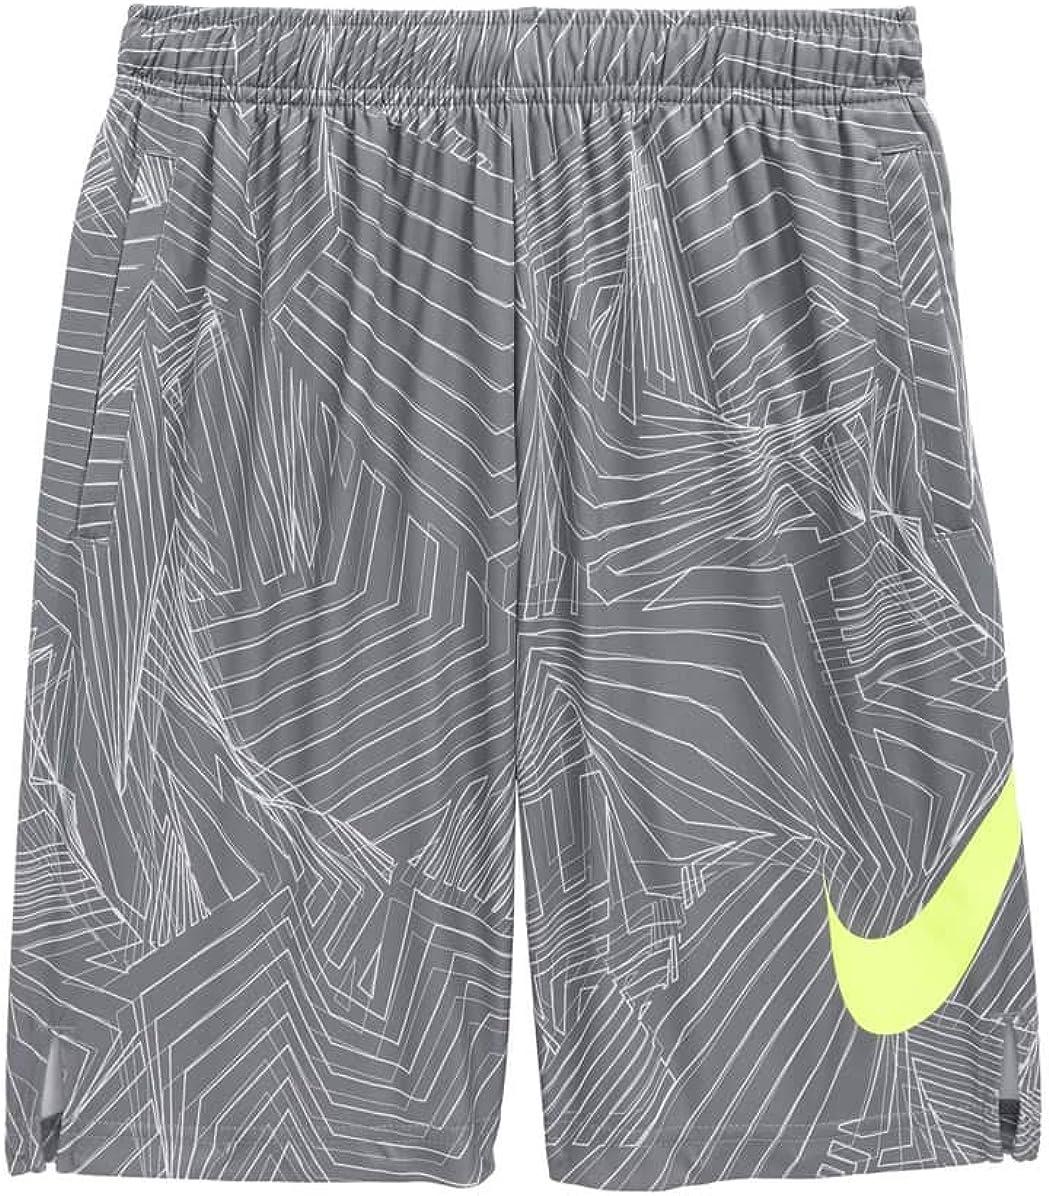 Nike Big Kids' (Boys') Dri-FIT Training Shorts (Black(892490-010)/Cool Grey